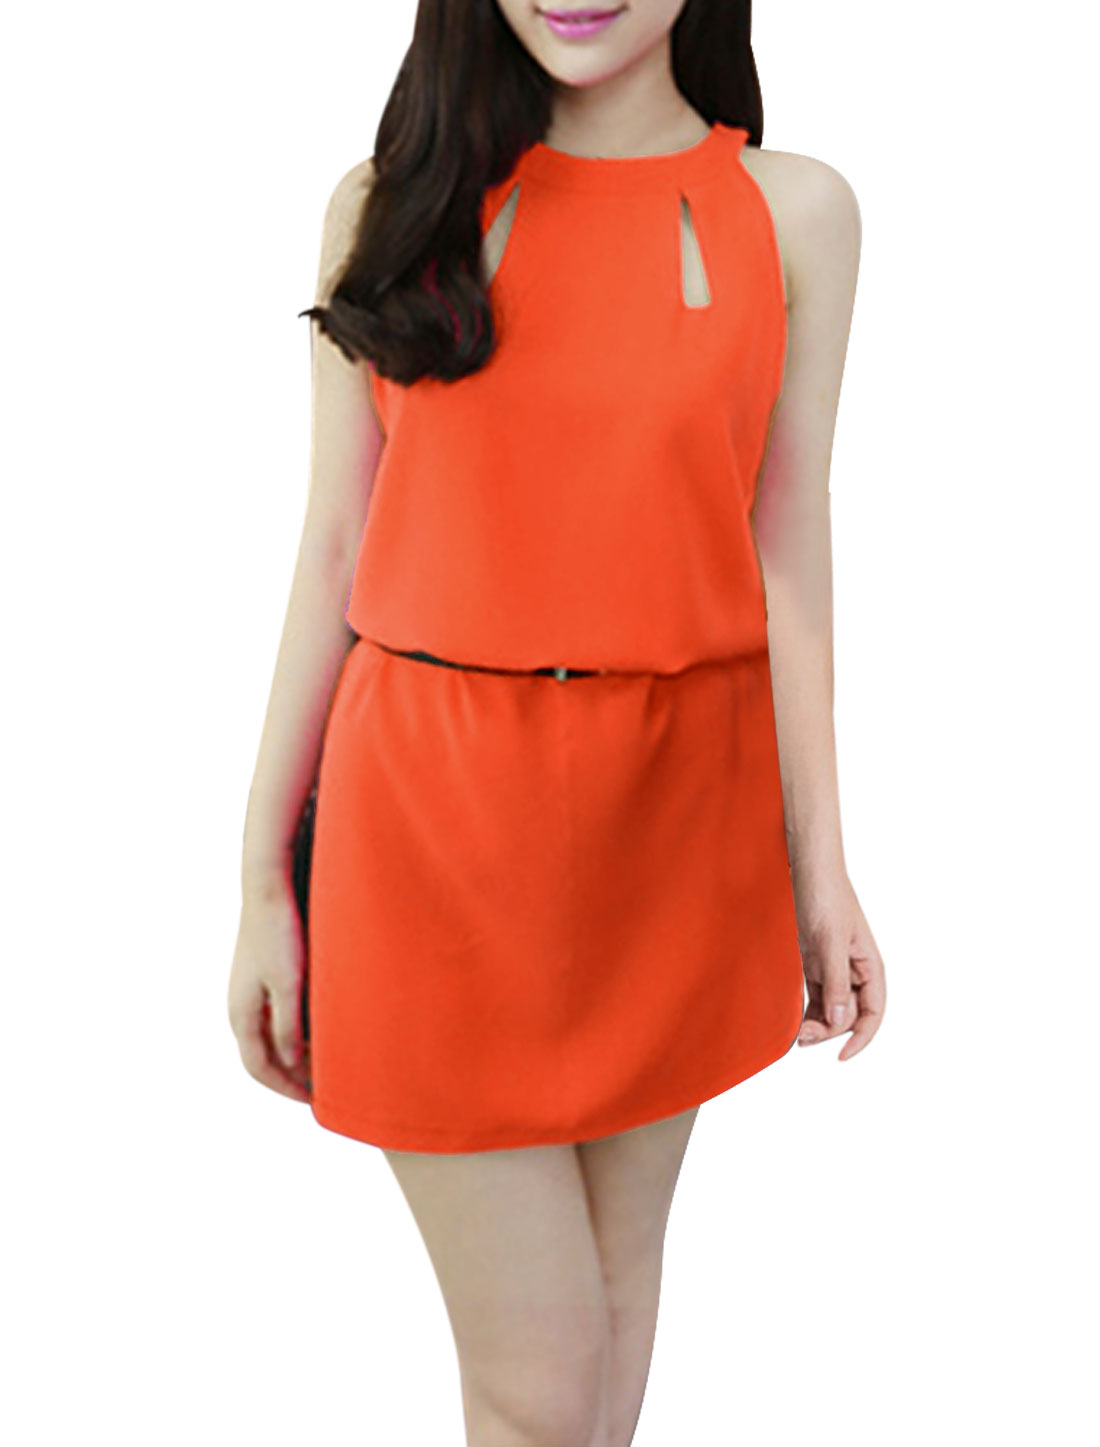 Women Zip Closure Back Sleeveless Belt Dress Orange XS